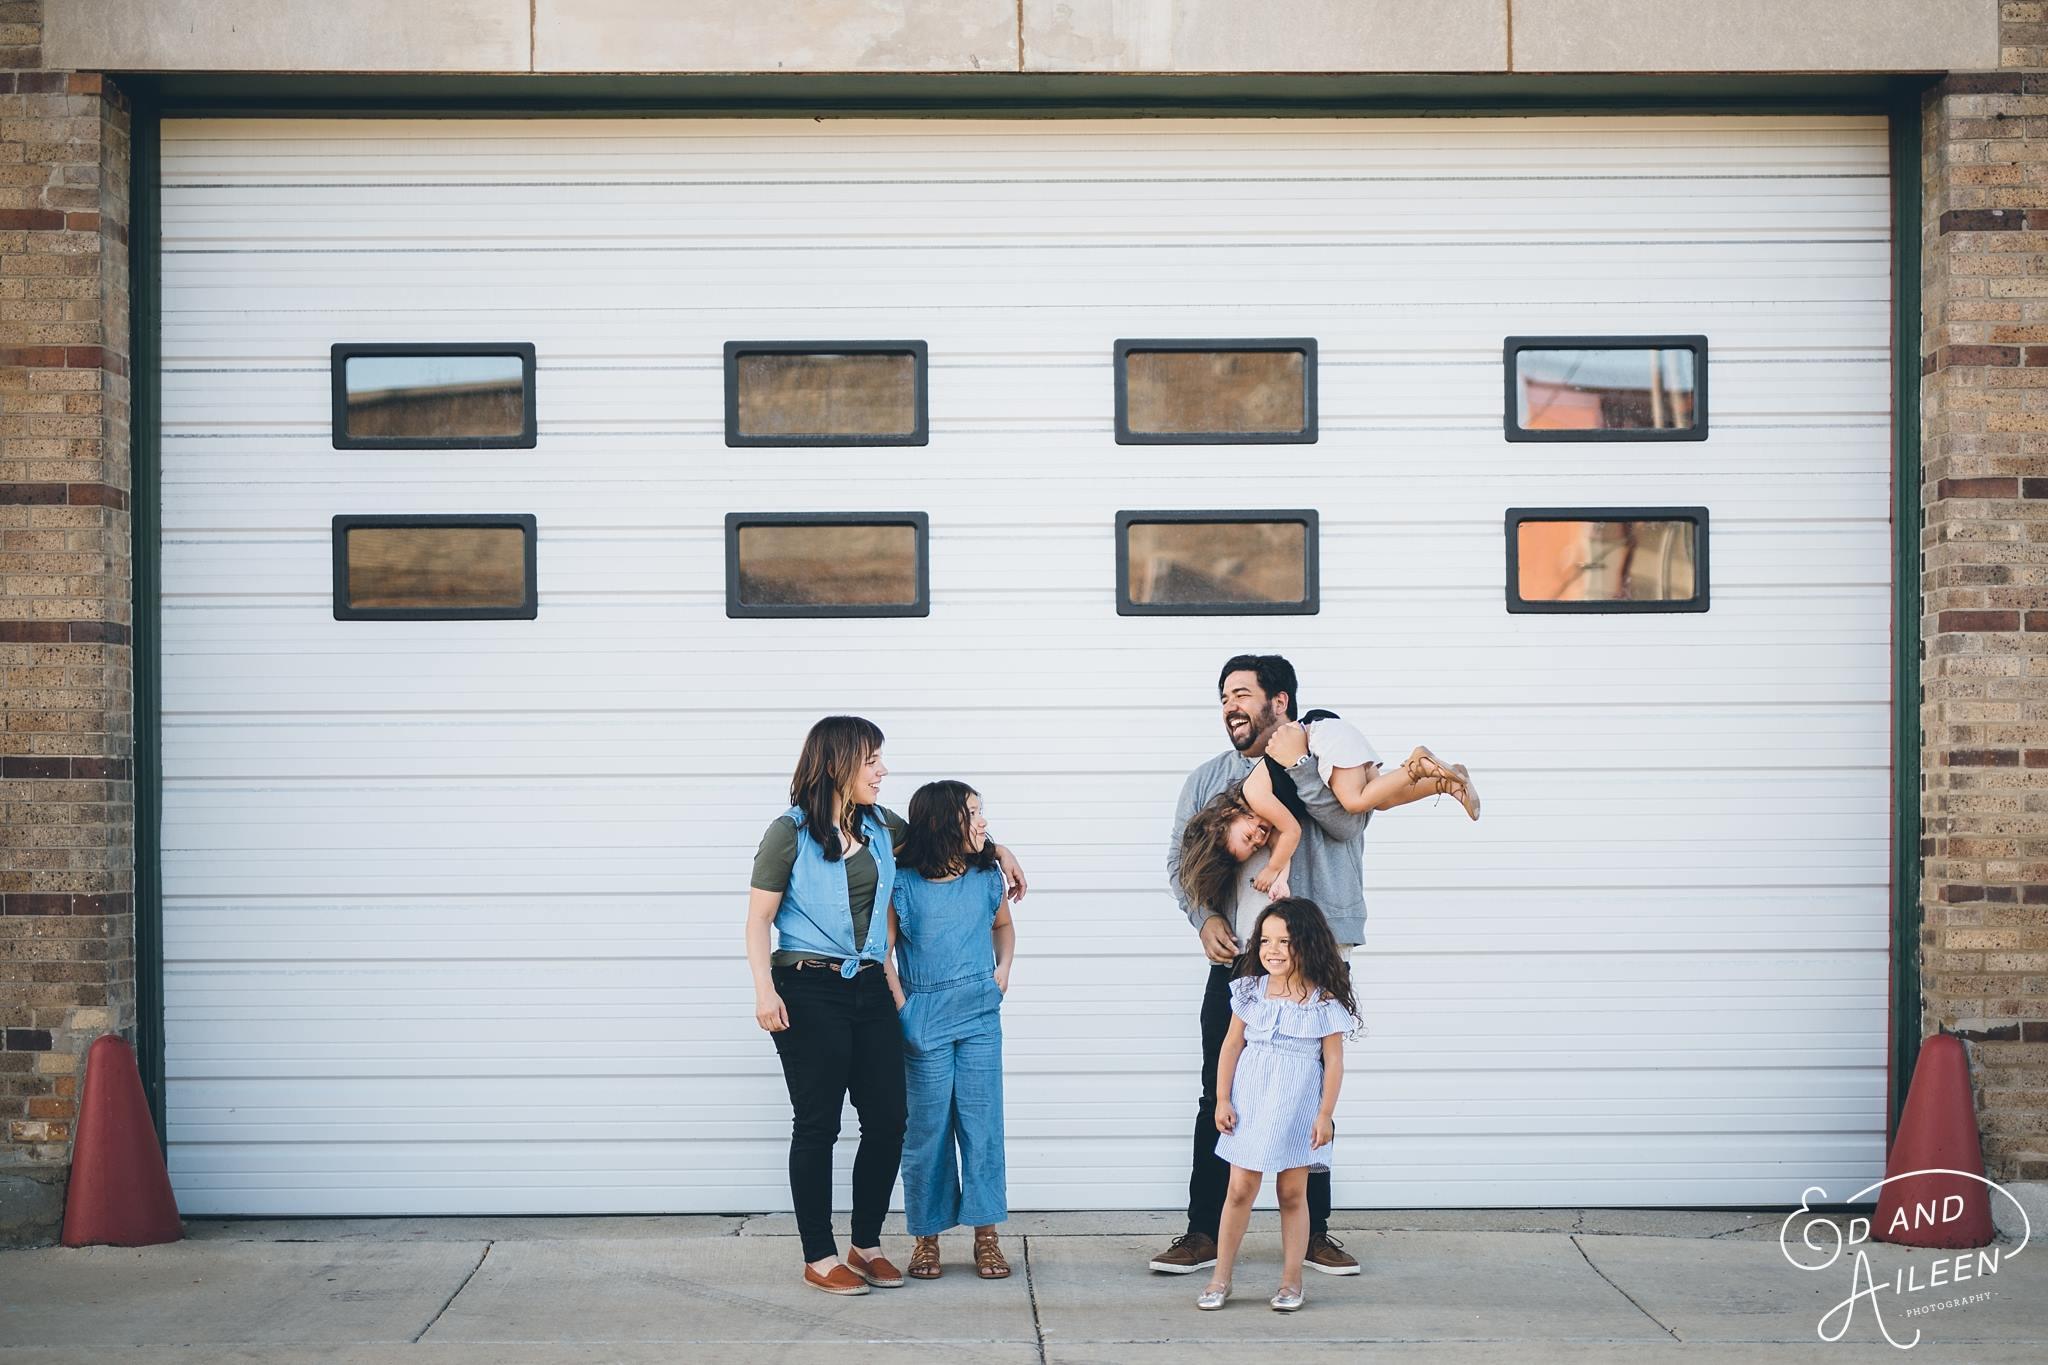 edandaileenphotography_lopezfamily.jpg